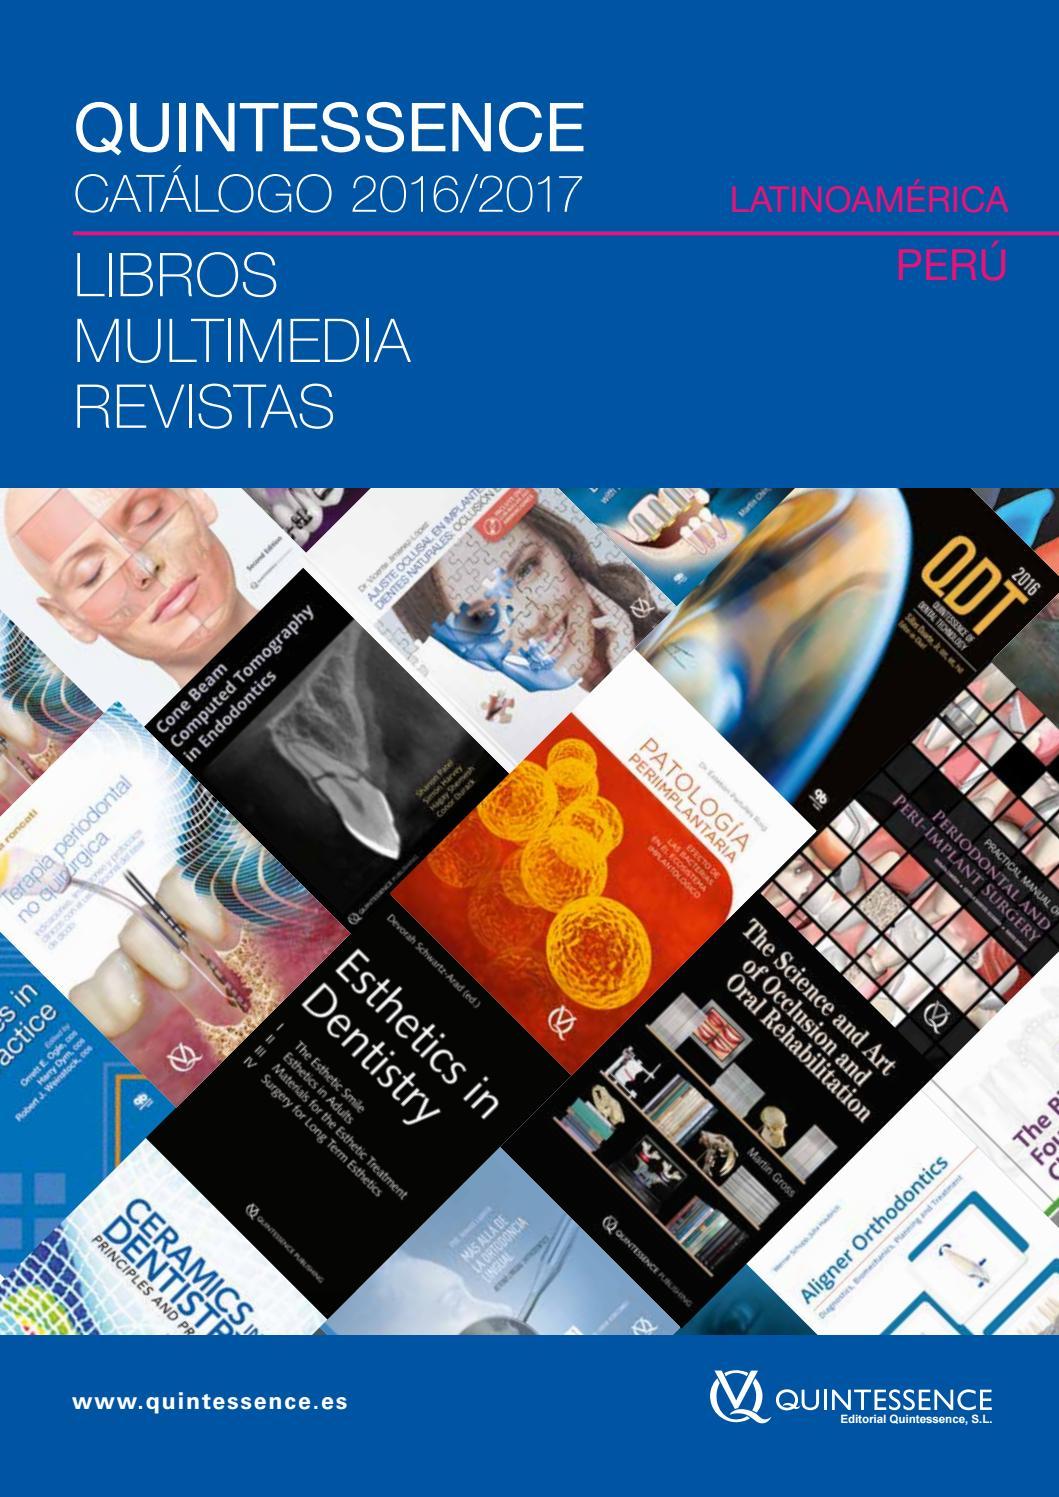 Catalogo Quintessence2016 Perú by Quintessence Perú - issuu